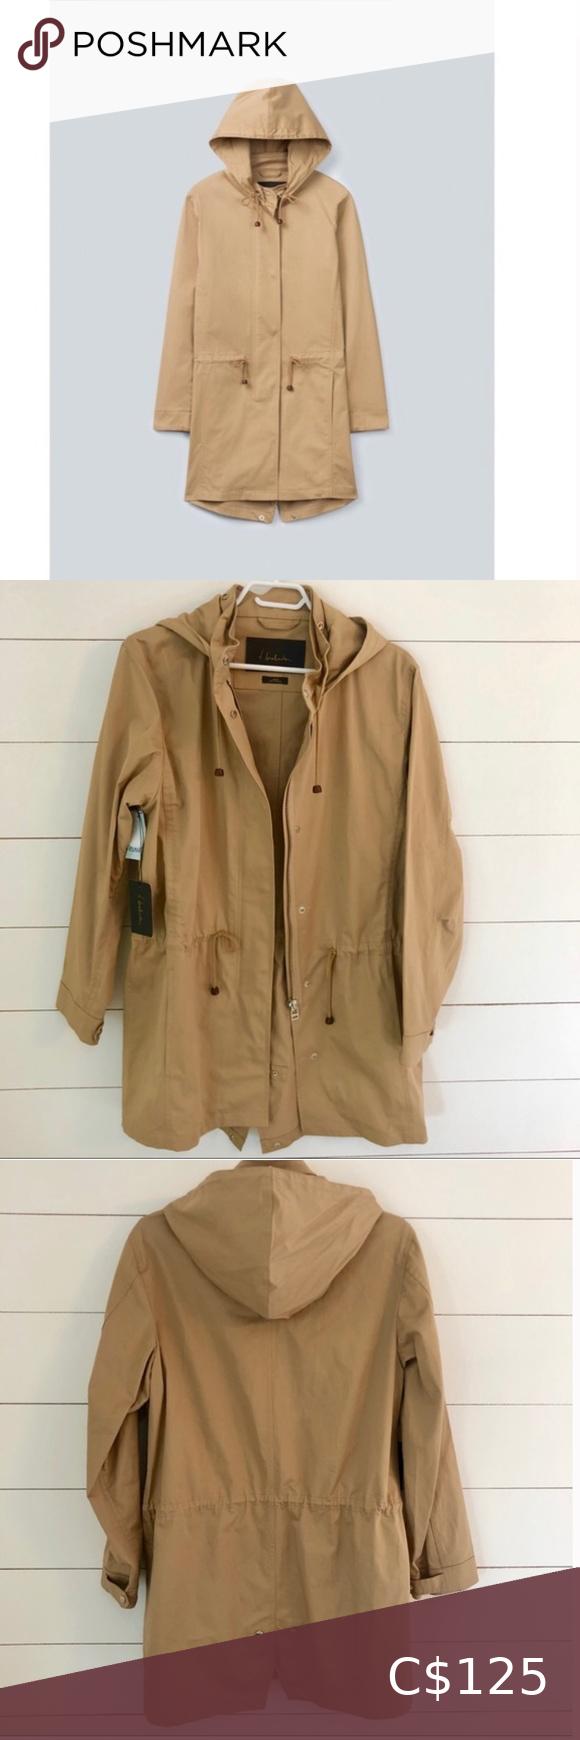 Aritzia T Babaton Scott Coat In Tawny Coats Jackets Women Long Coat Jacket Trendy Vest [ 1740 x 580 Pixel ]